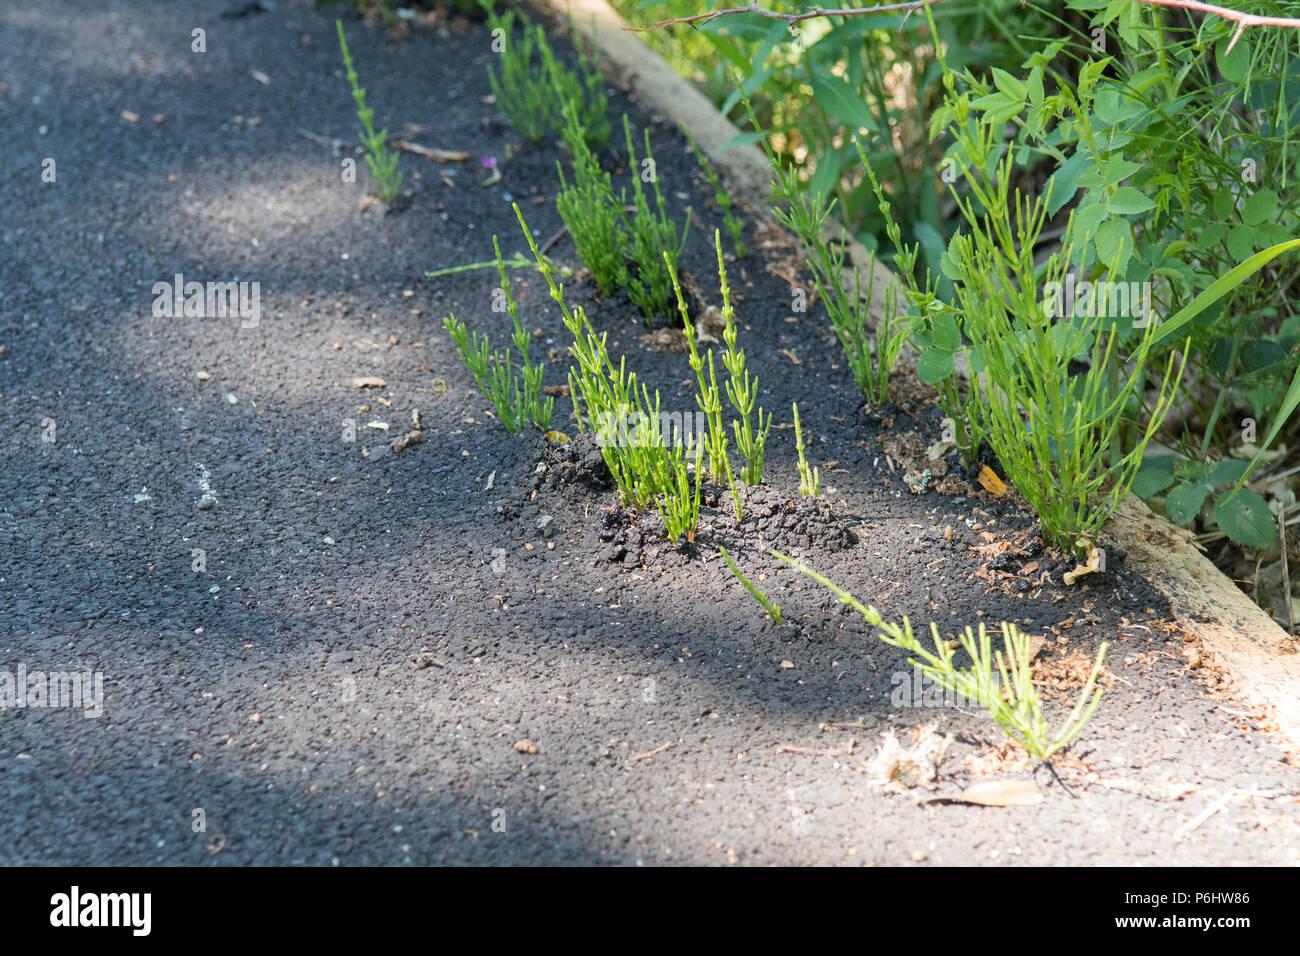 Horsetail weed - equisetum arvense - growing through tarmac - Scotland, UK - Stock Image